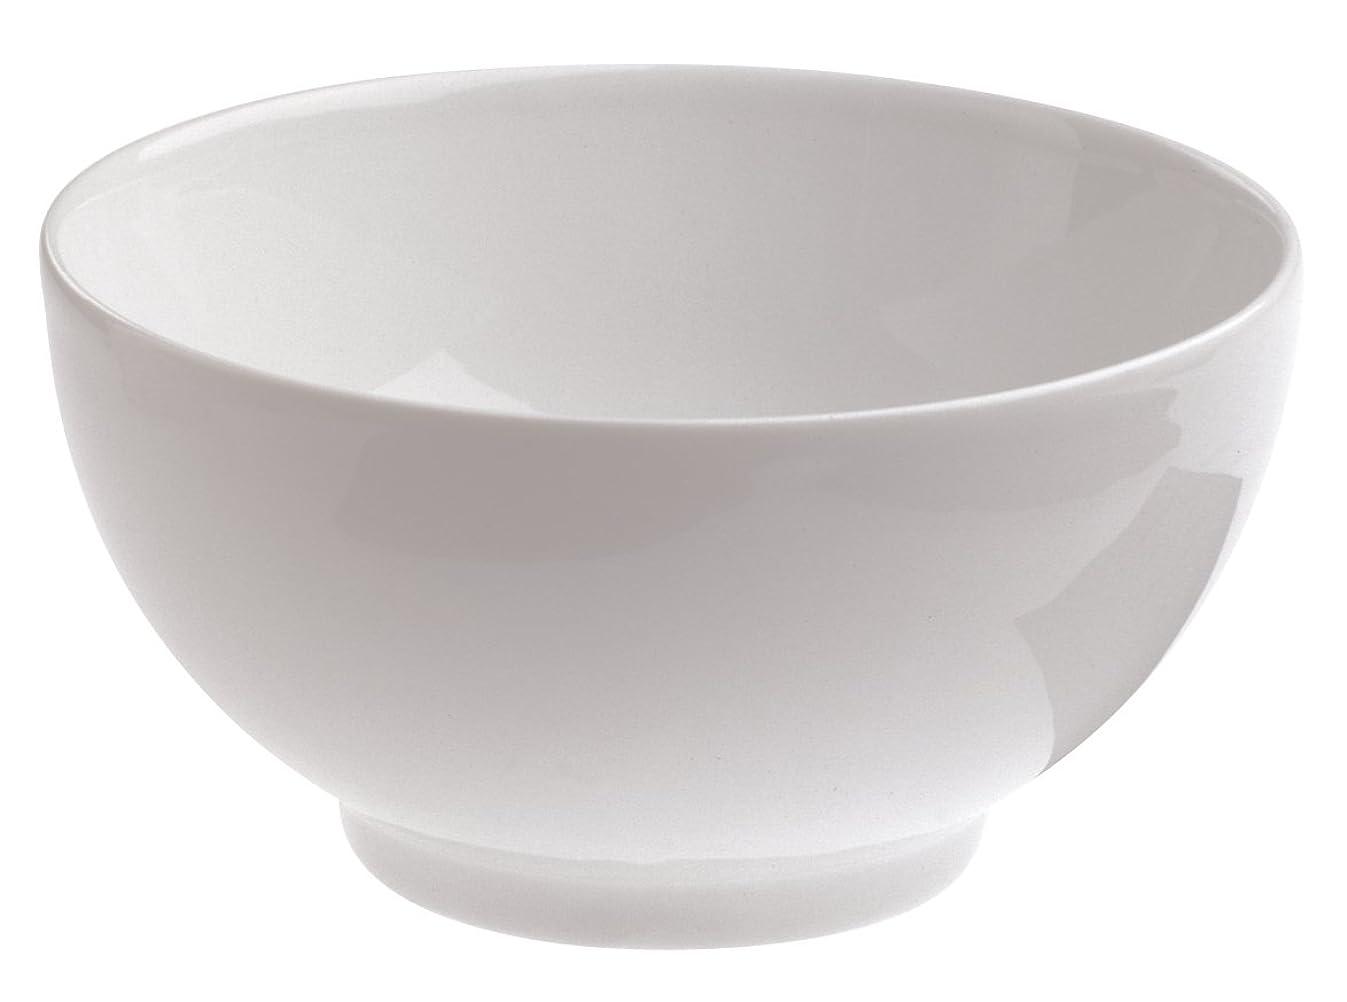 REVOL 612444/4 M592 Set of 4 bowls, 19.50oz, White